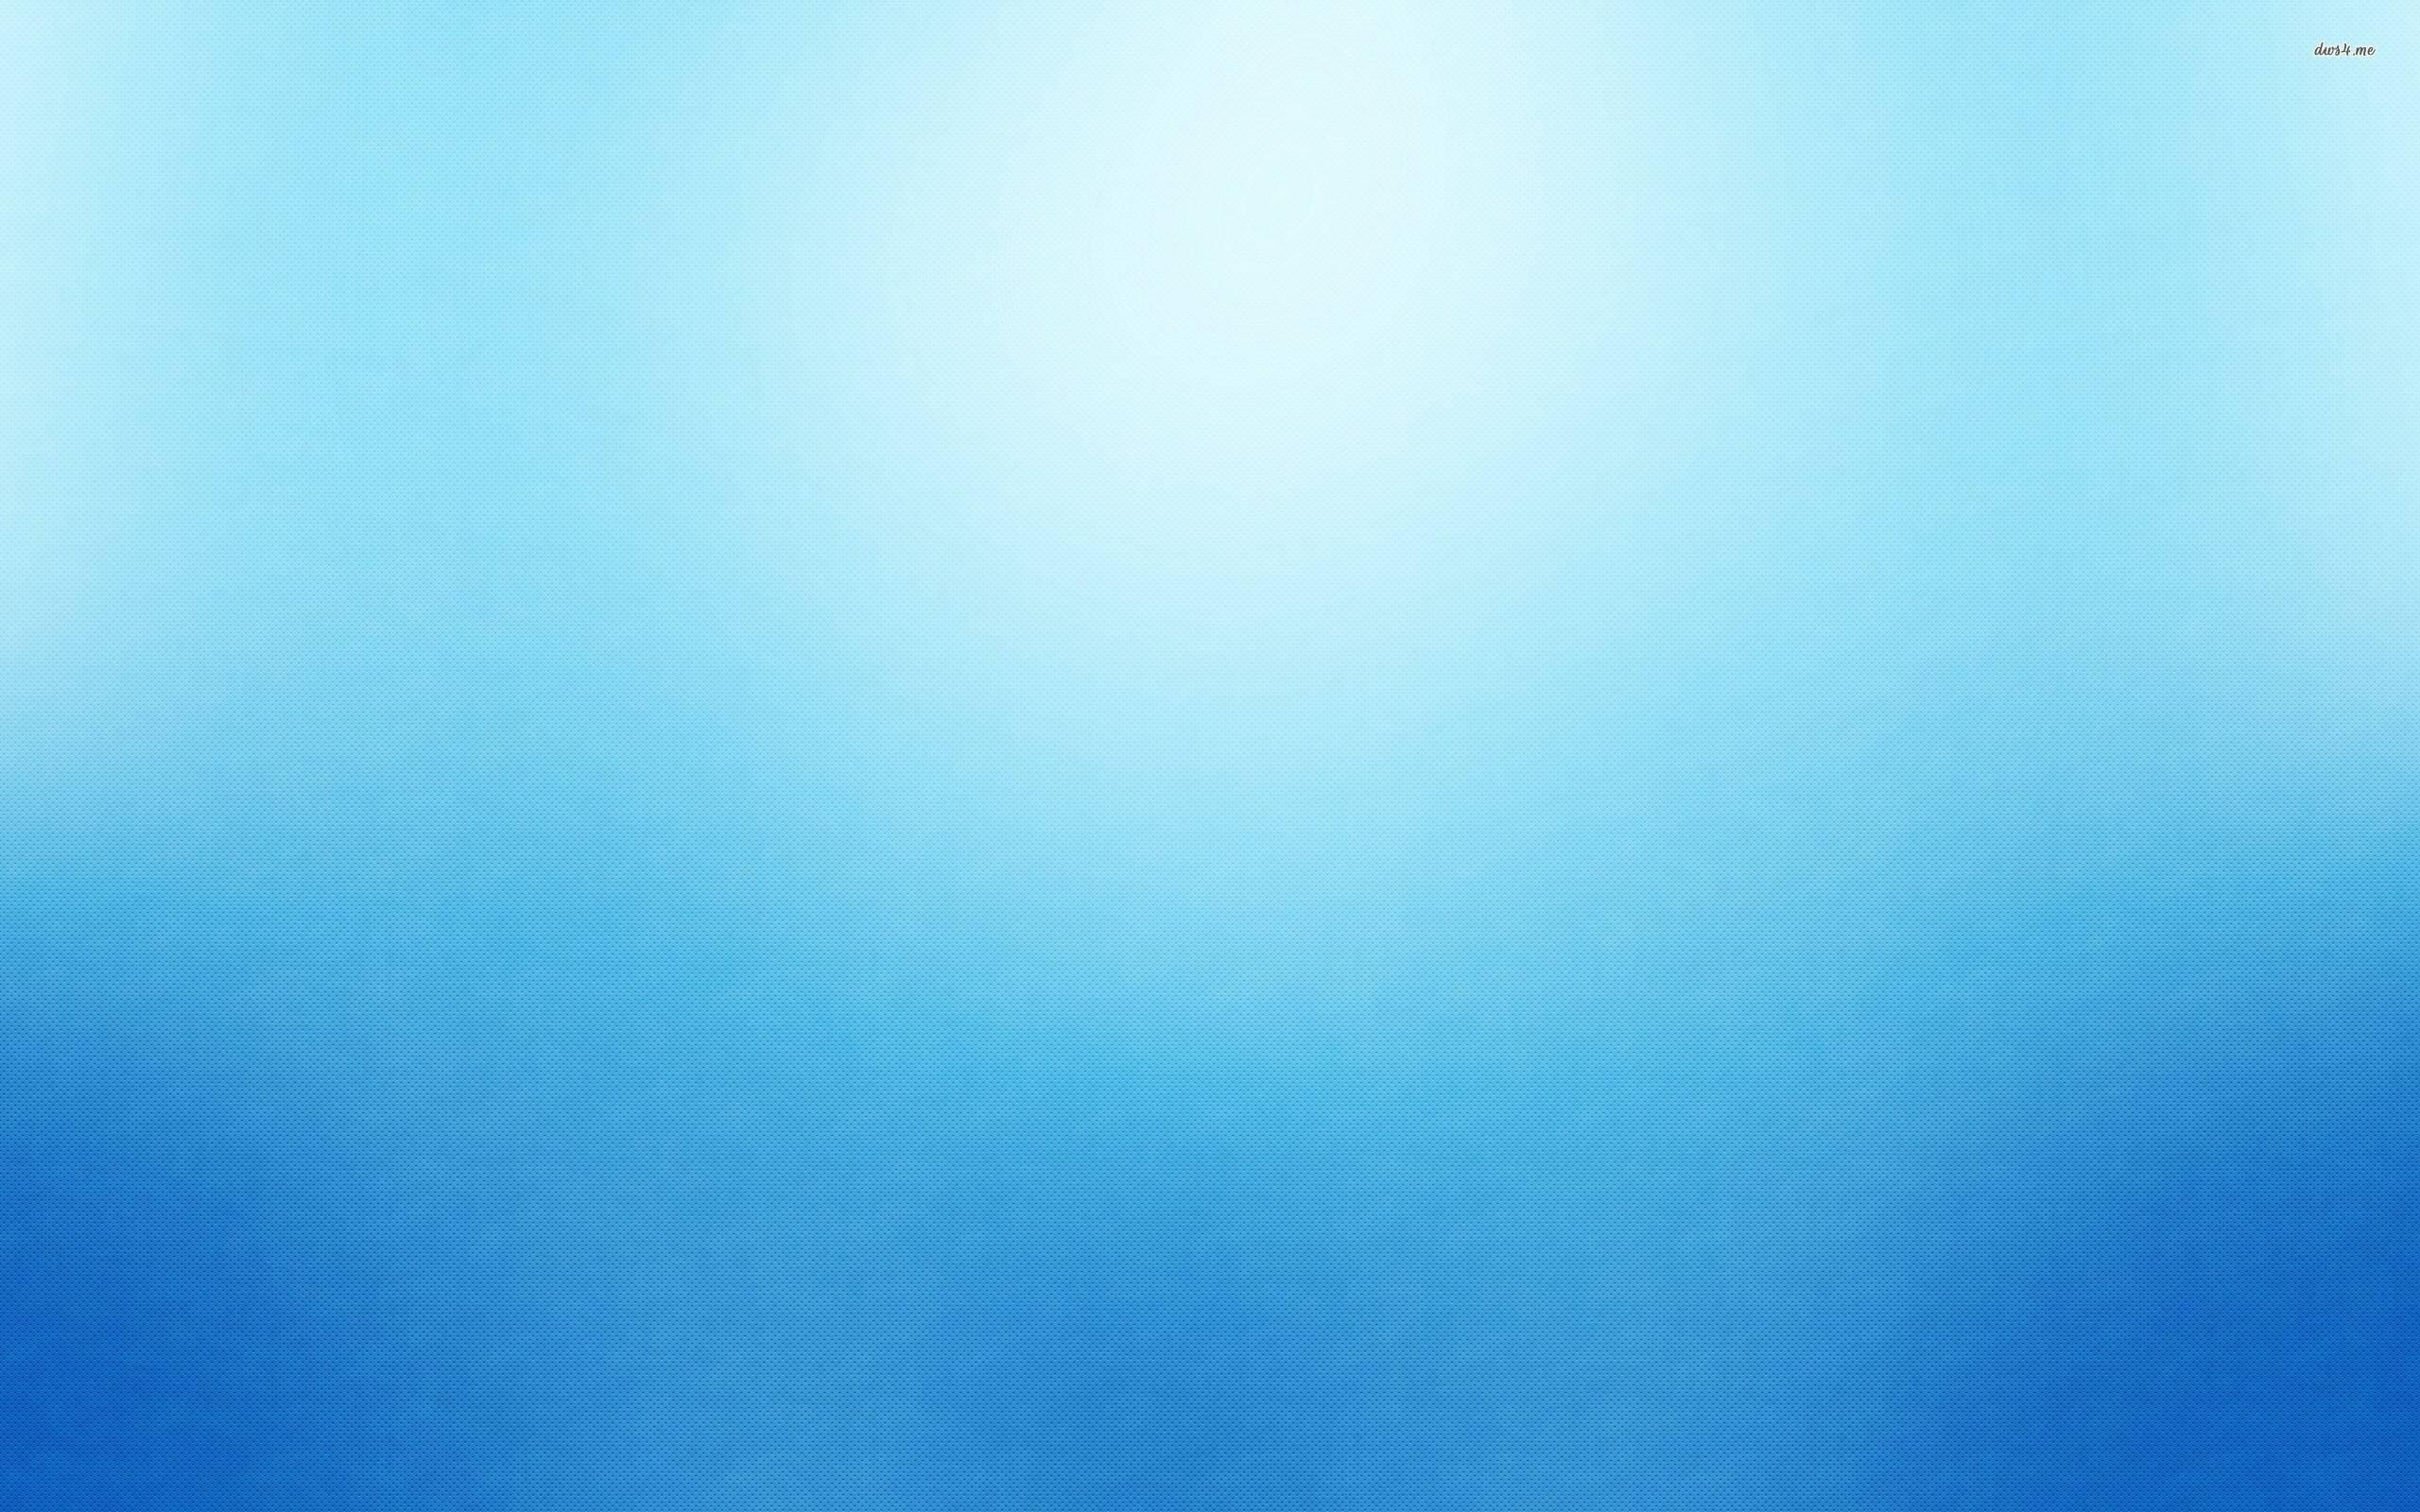 light blue wallpapers - wallpaper cave